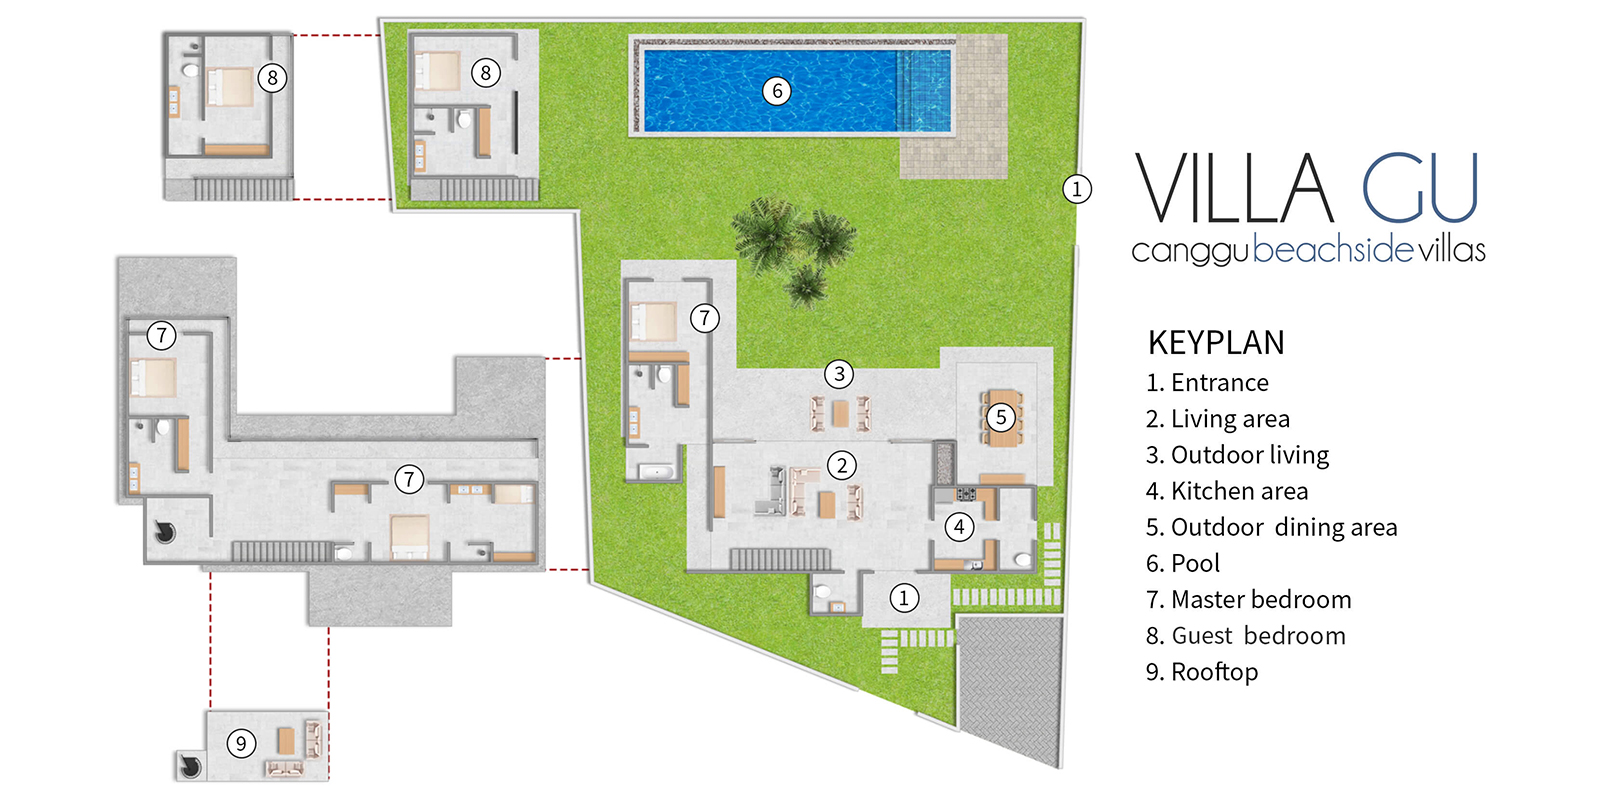 Villa Gu Floor Plan | Canggu, Bali